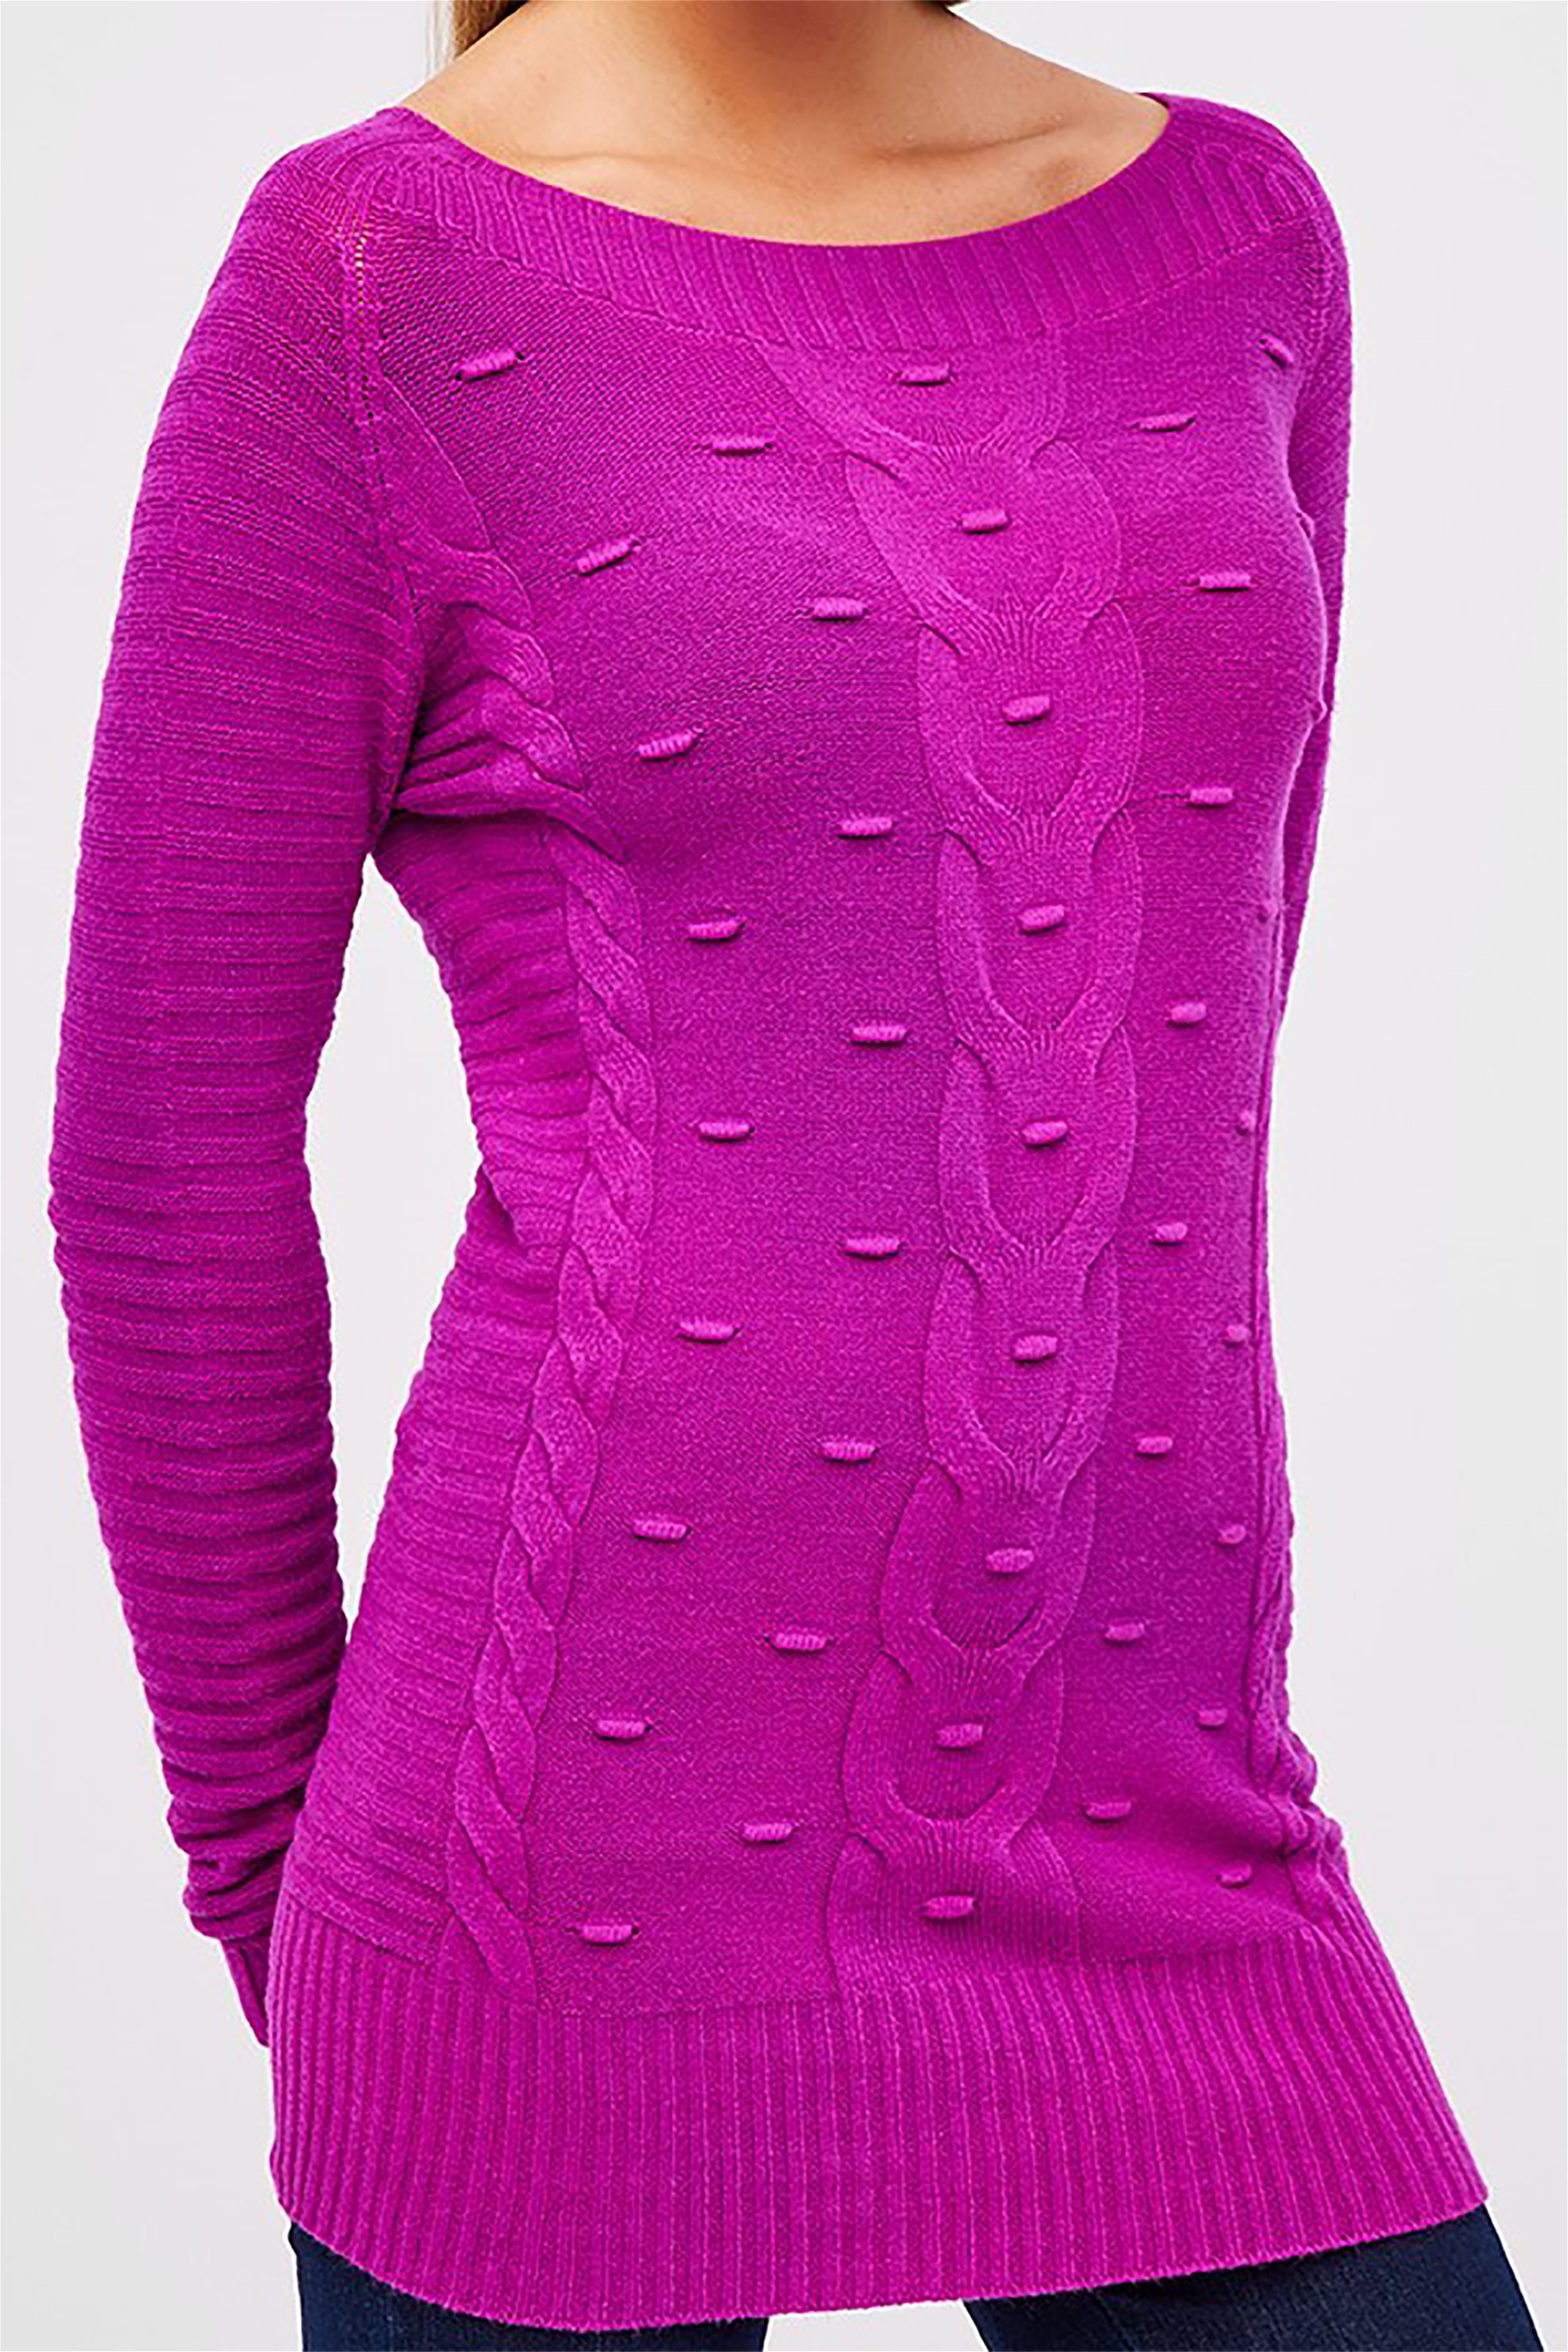 Forel γυναικεία μπλούζα πλεκτή ribbed με ανάγλυφο σχέδιο - 599006 - Μοβ